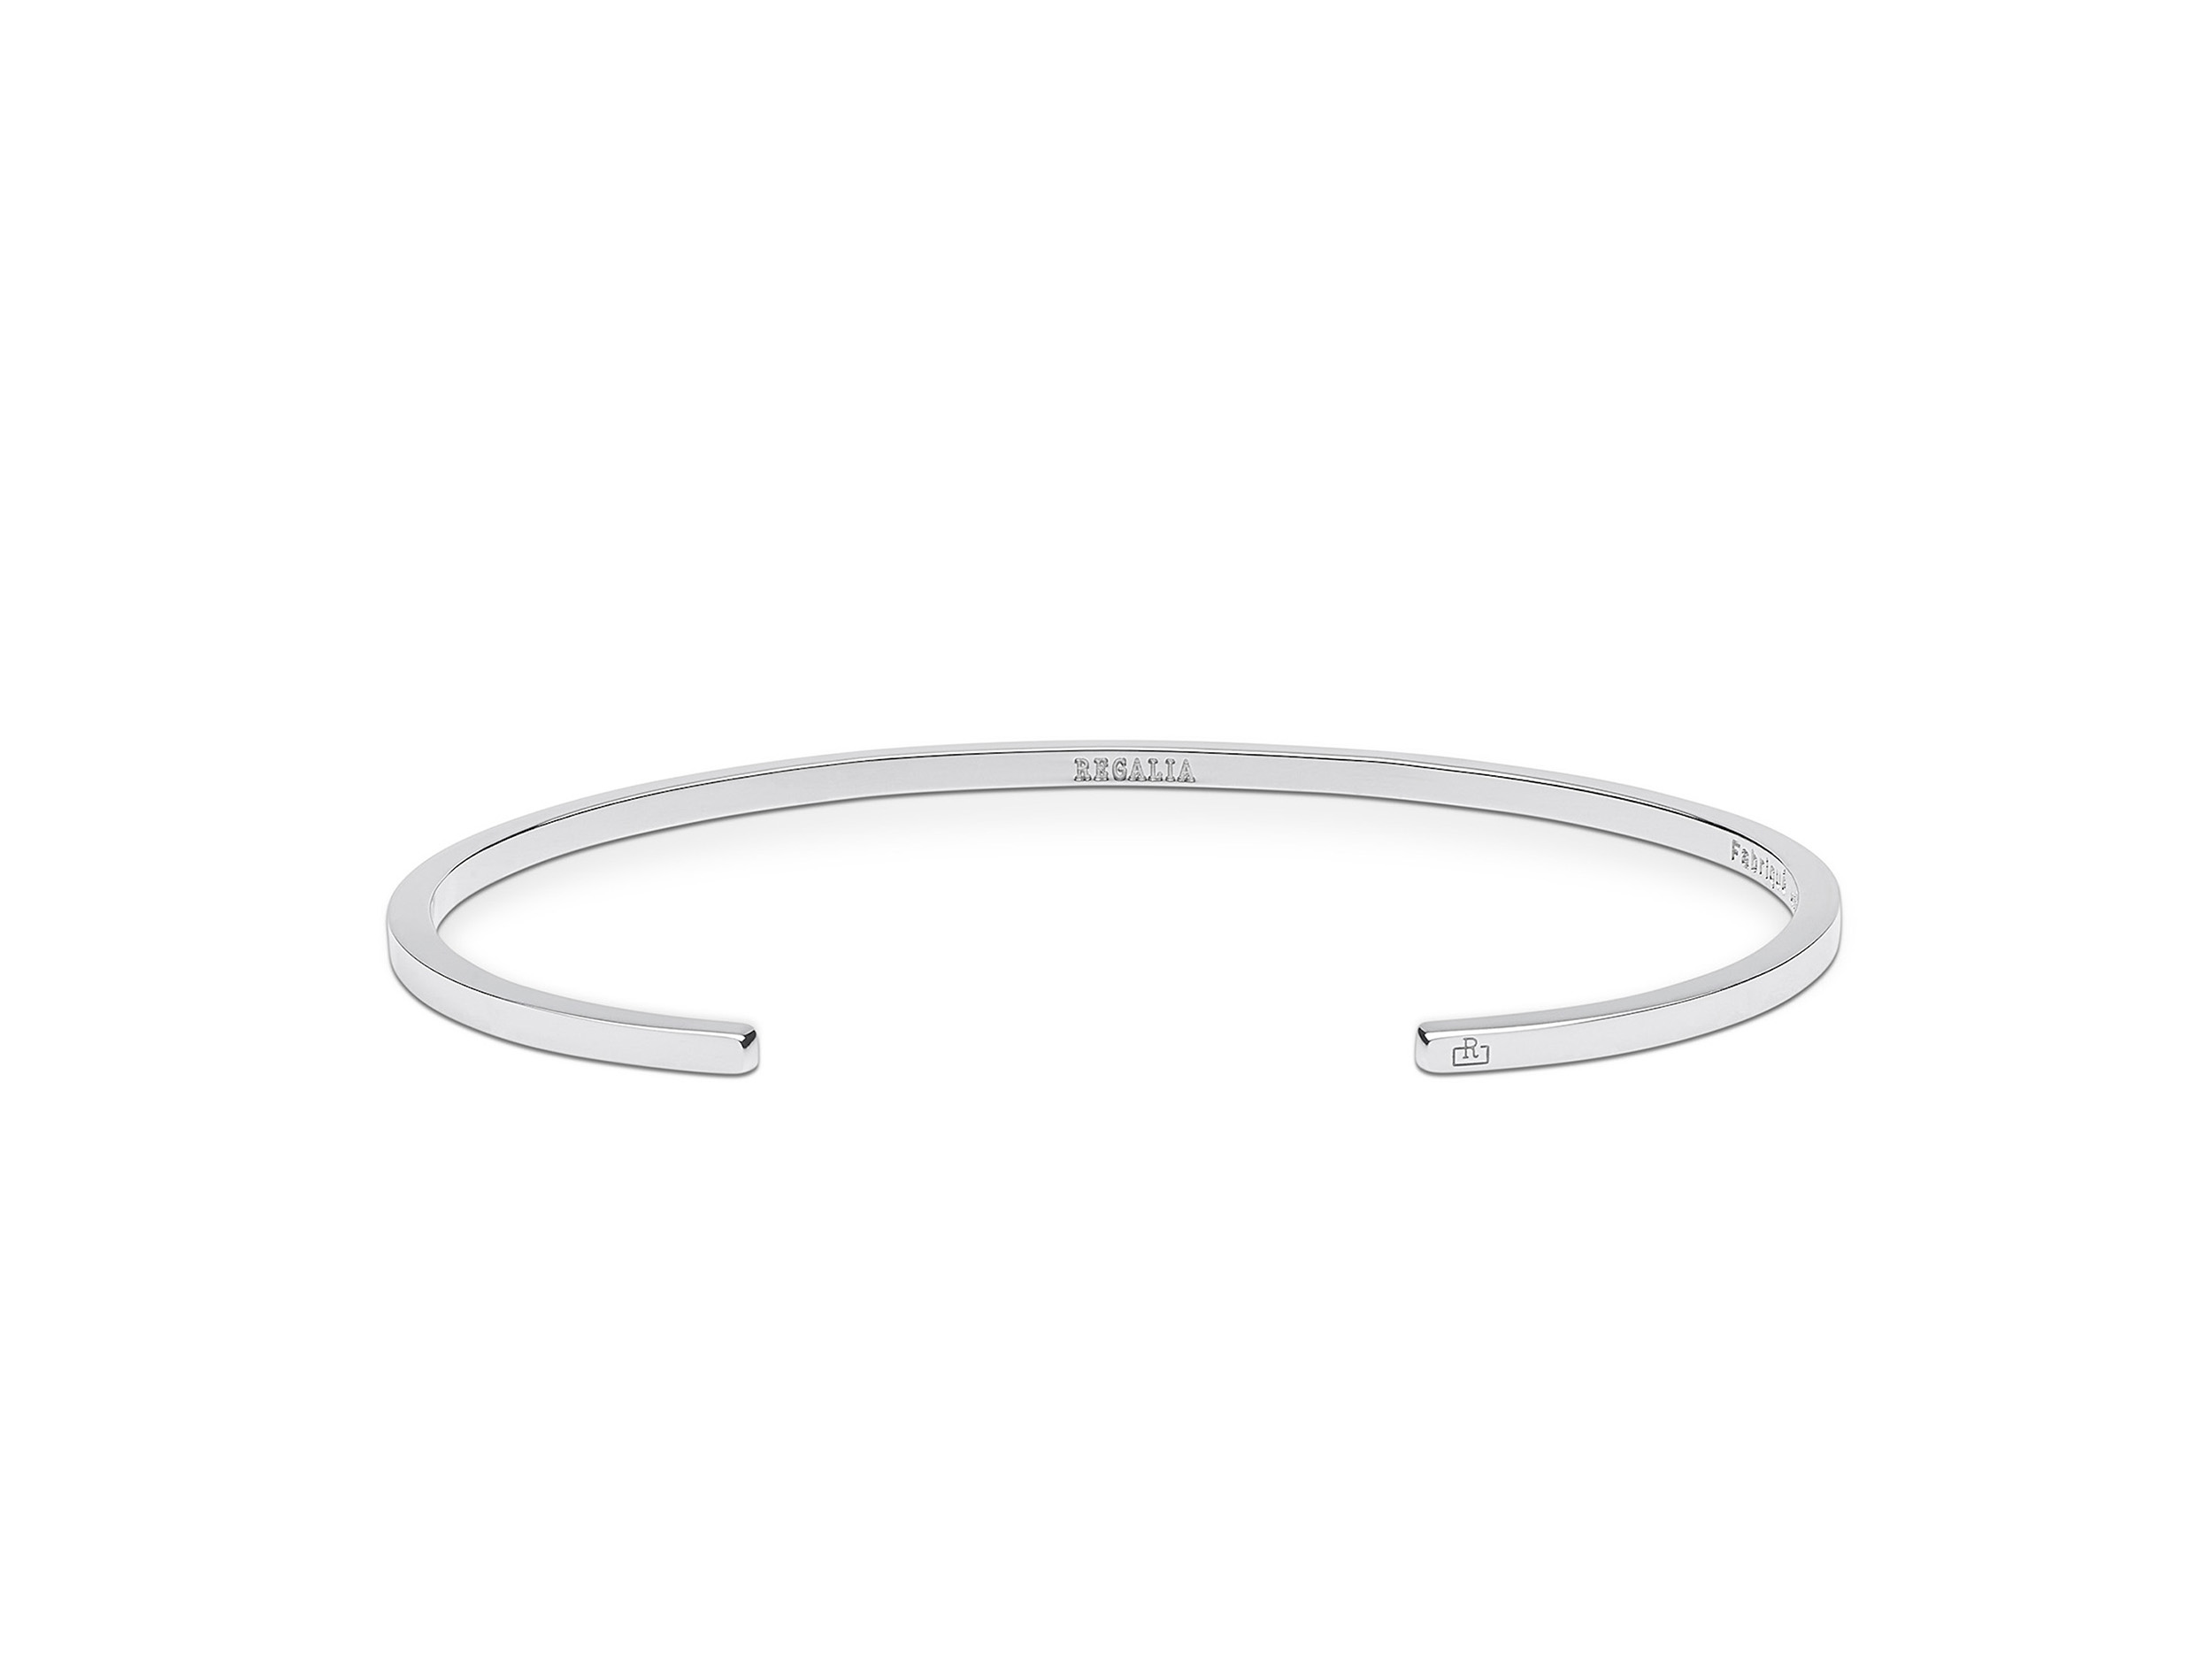 Regalia bijou bracelet argent massif homme femme-REN2P1